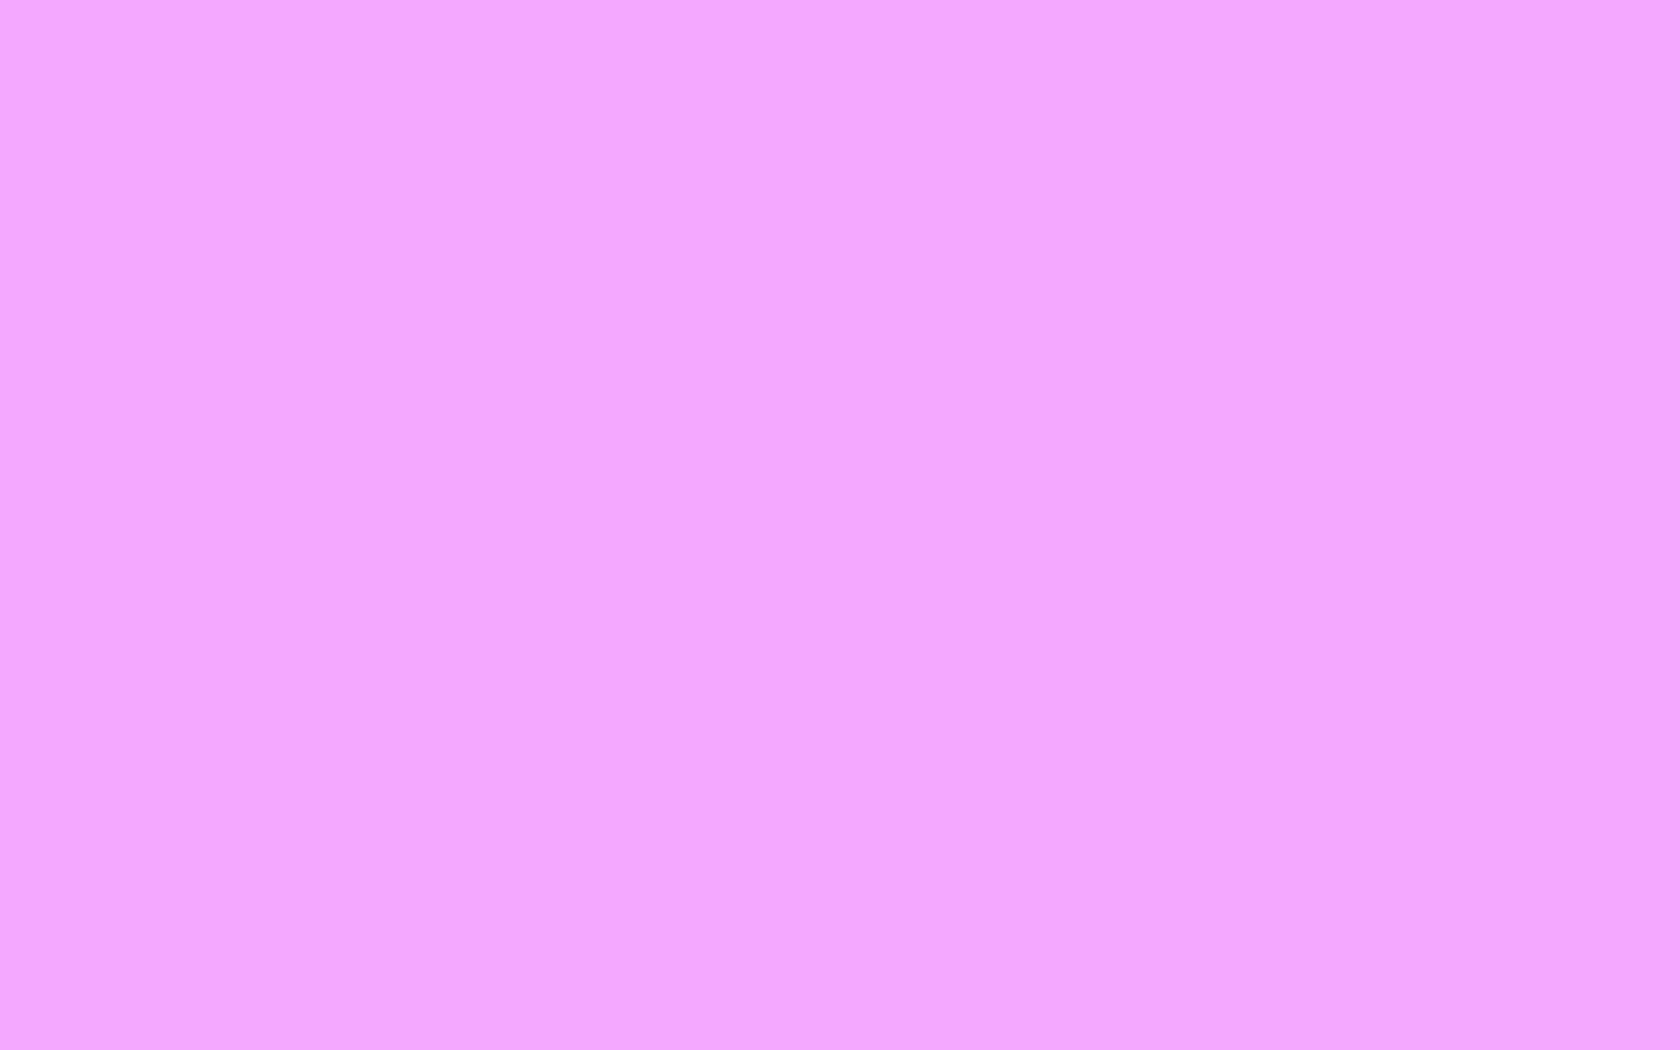 1680x1050 Rich Brilliant Lavender Solid Color Background